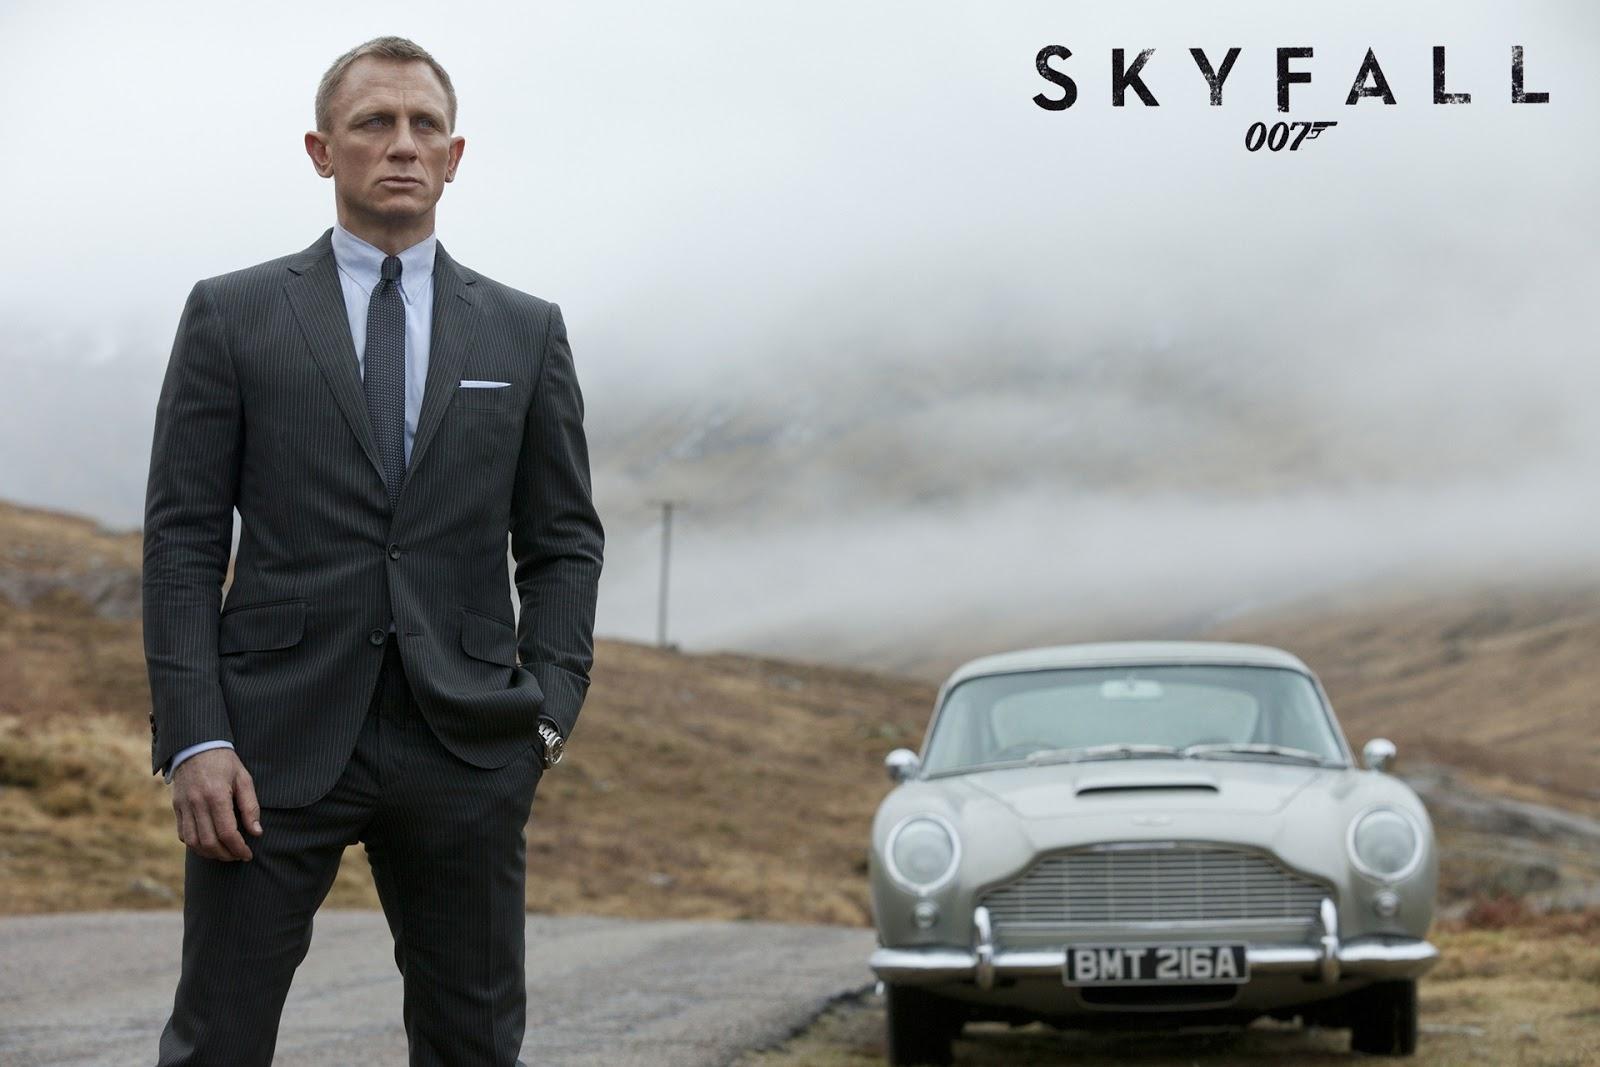 http://4.bp.blogspot.com/-1CQBRn3_Oek/UKRxrCKu7YI/AAAAAAAAAu0/Gff7RG6sMco/s1600/James-Bond-007-Skyfall-Wallpaper15.jpg